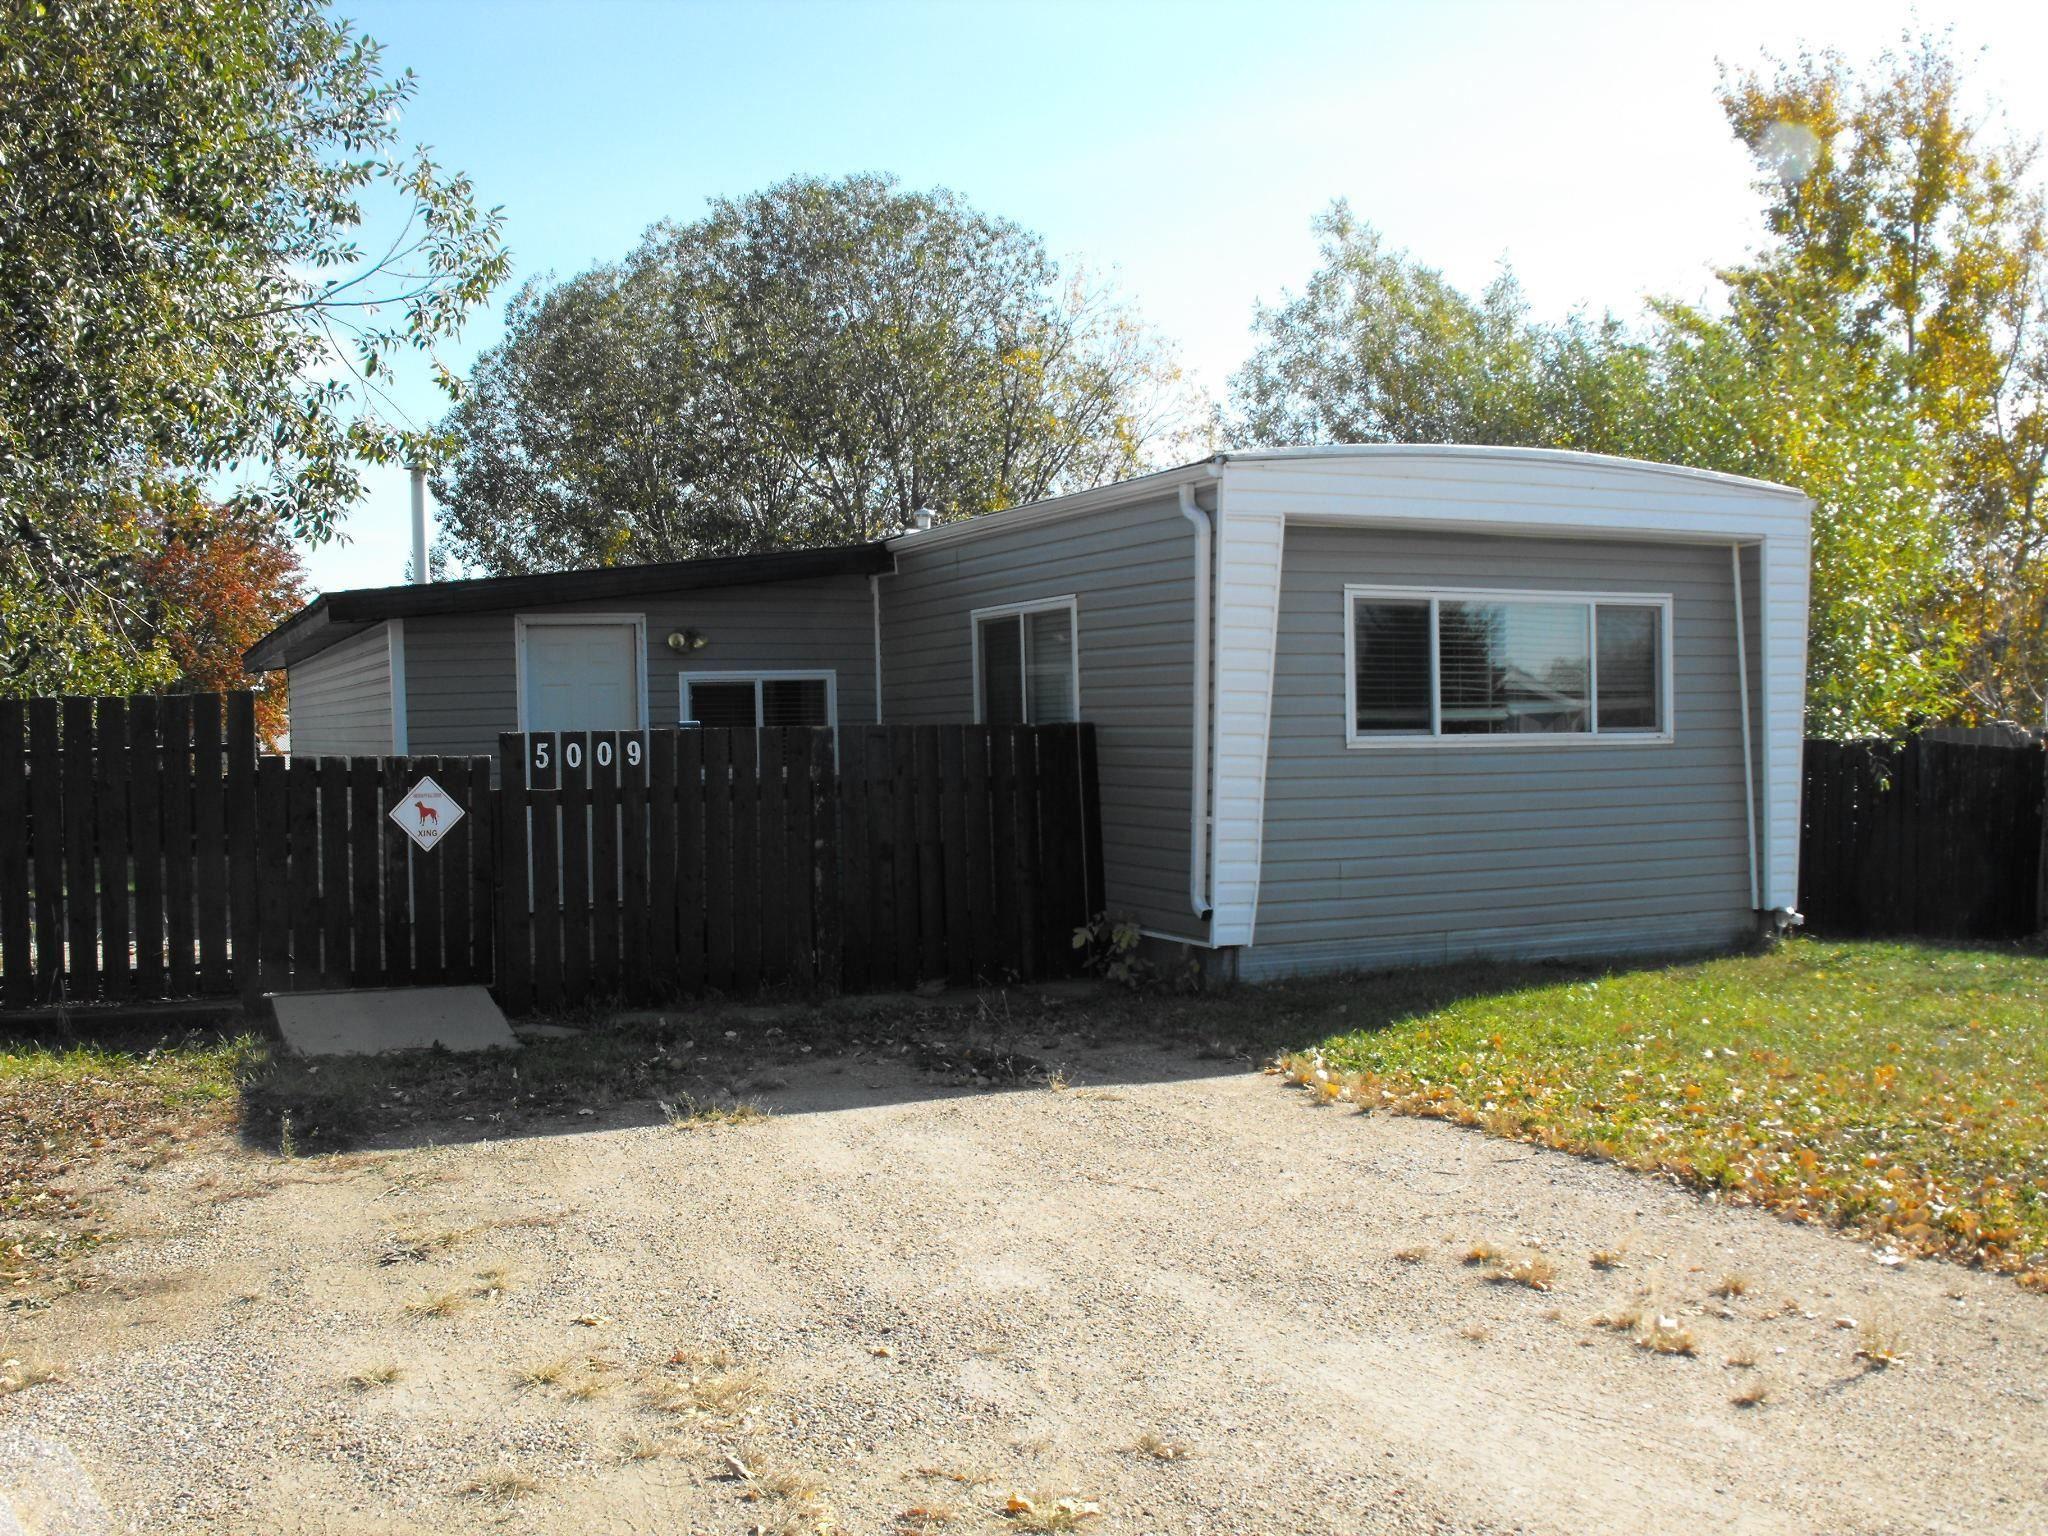 Main Photo: 5009 56 Street: Elk Point House for sale : MLS®# E4265897